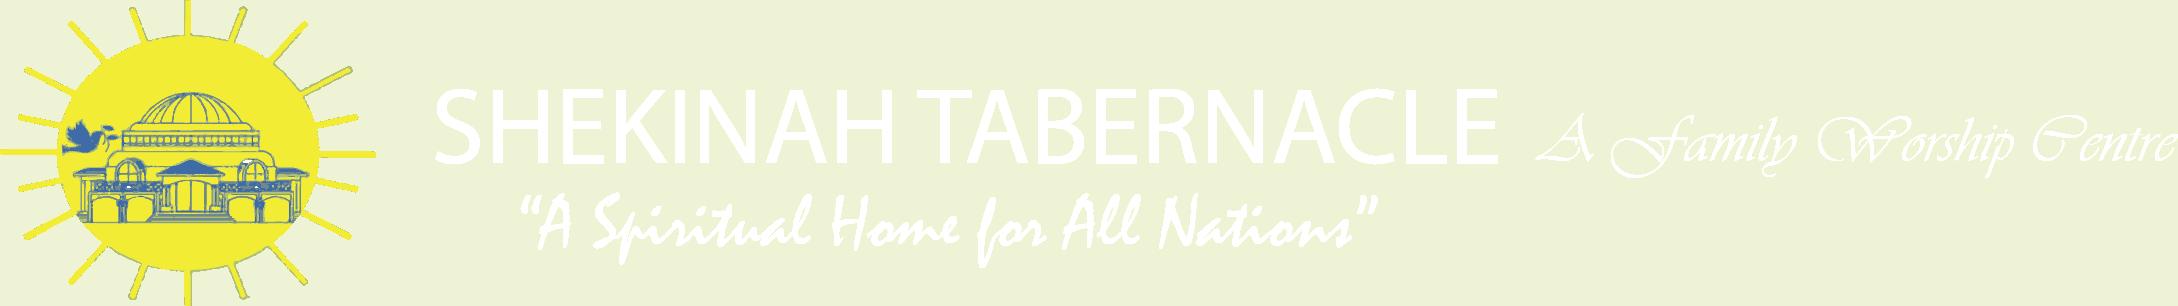 SHEKINAH TABERNACLE